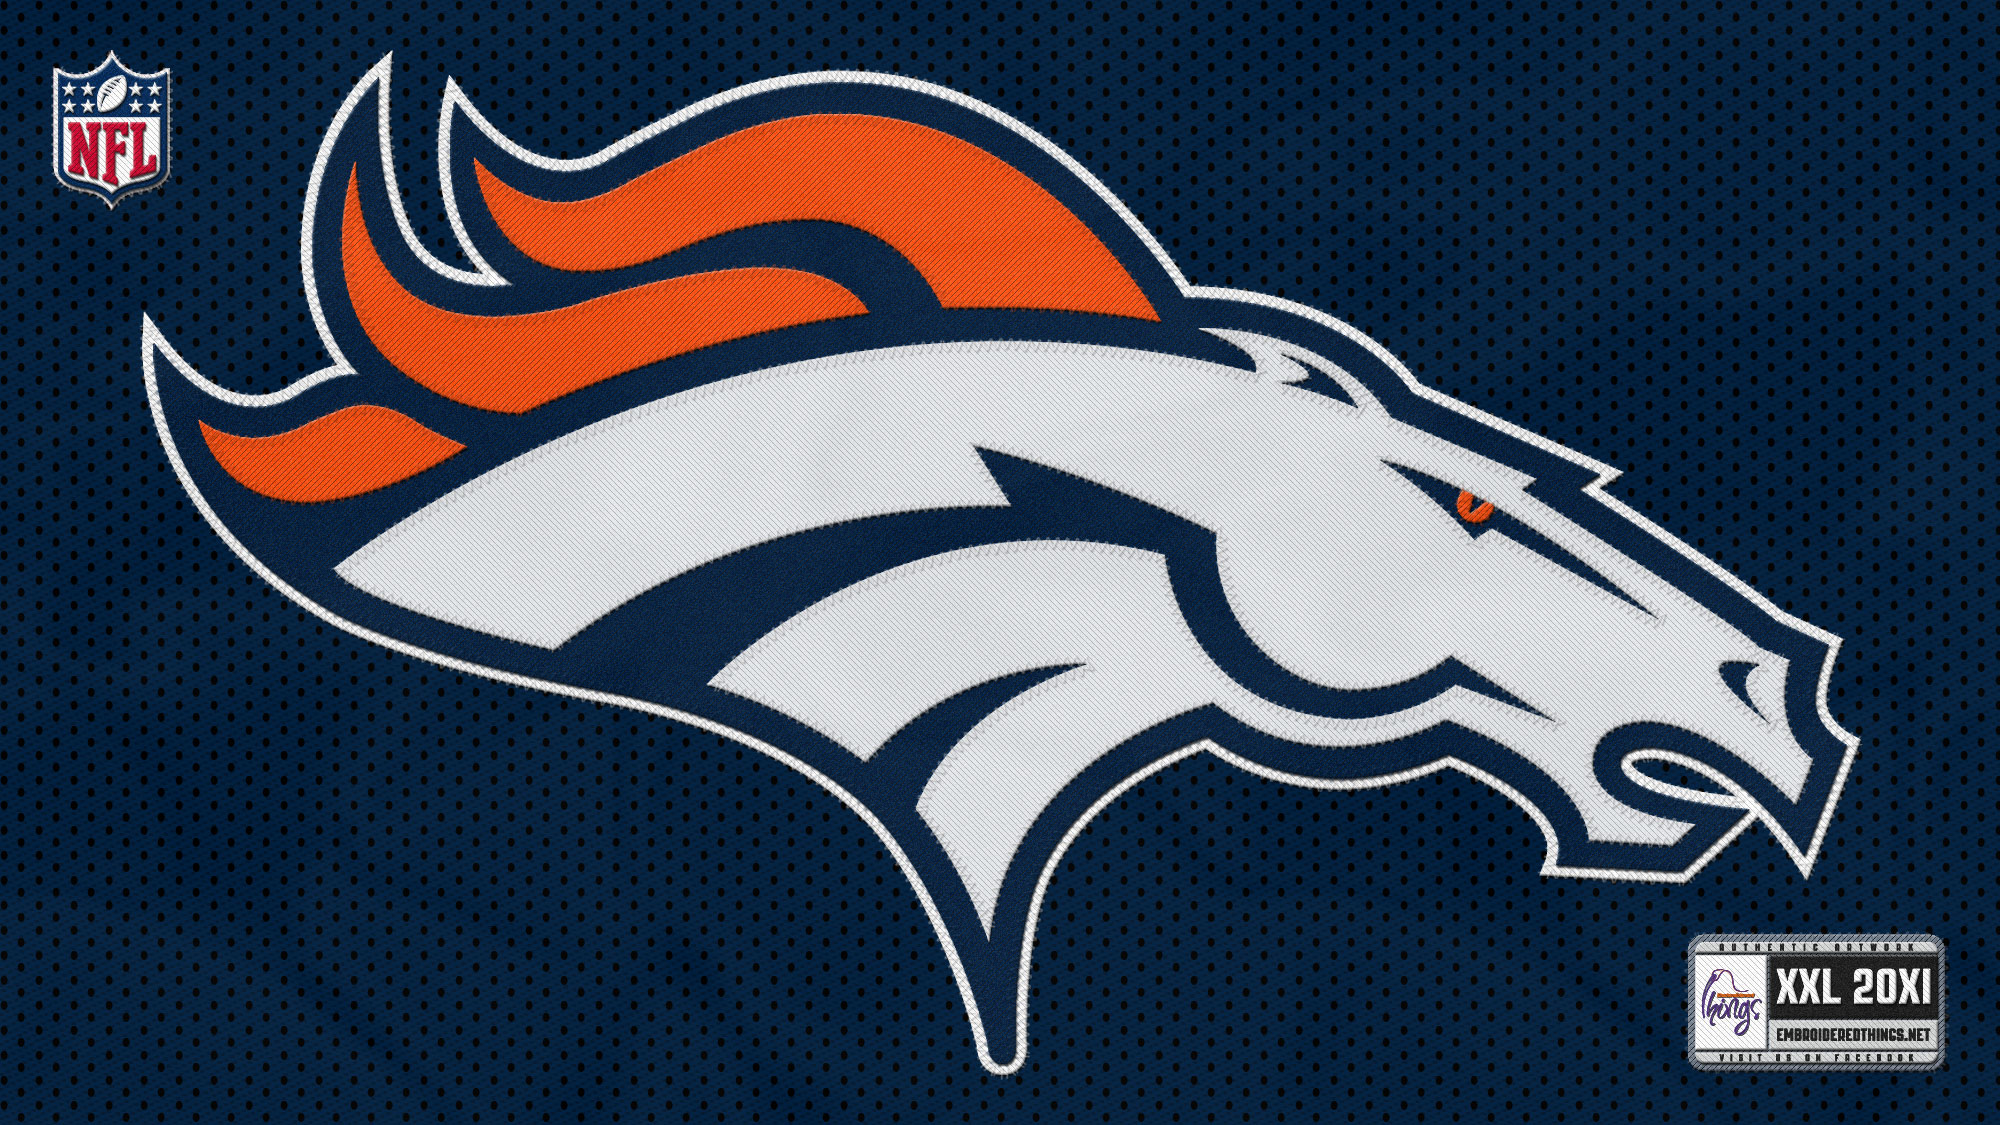 Denver Broncos Logo Hd Wallpaper The best denver broncos 2000x1125